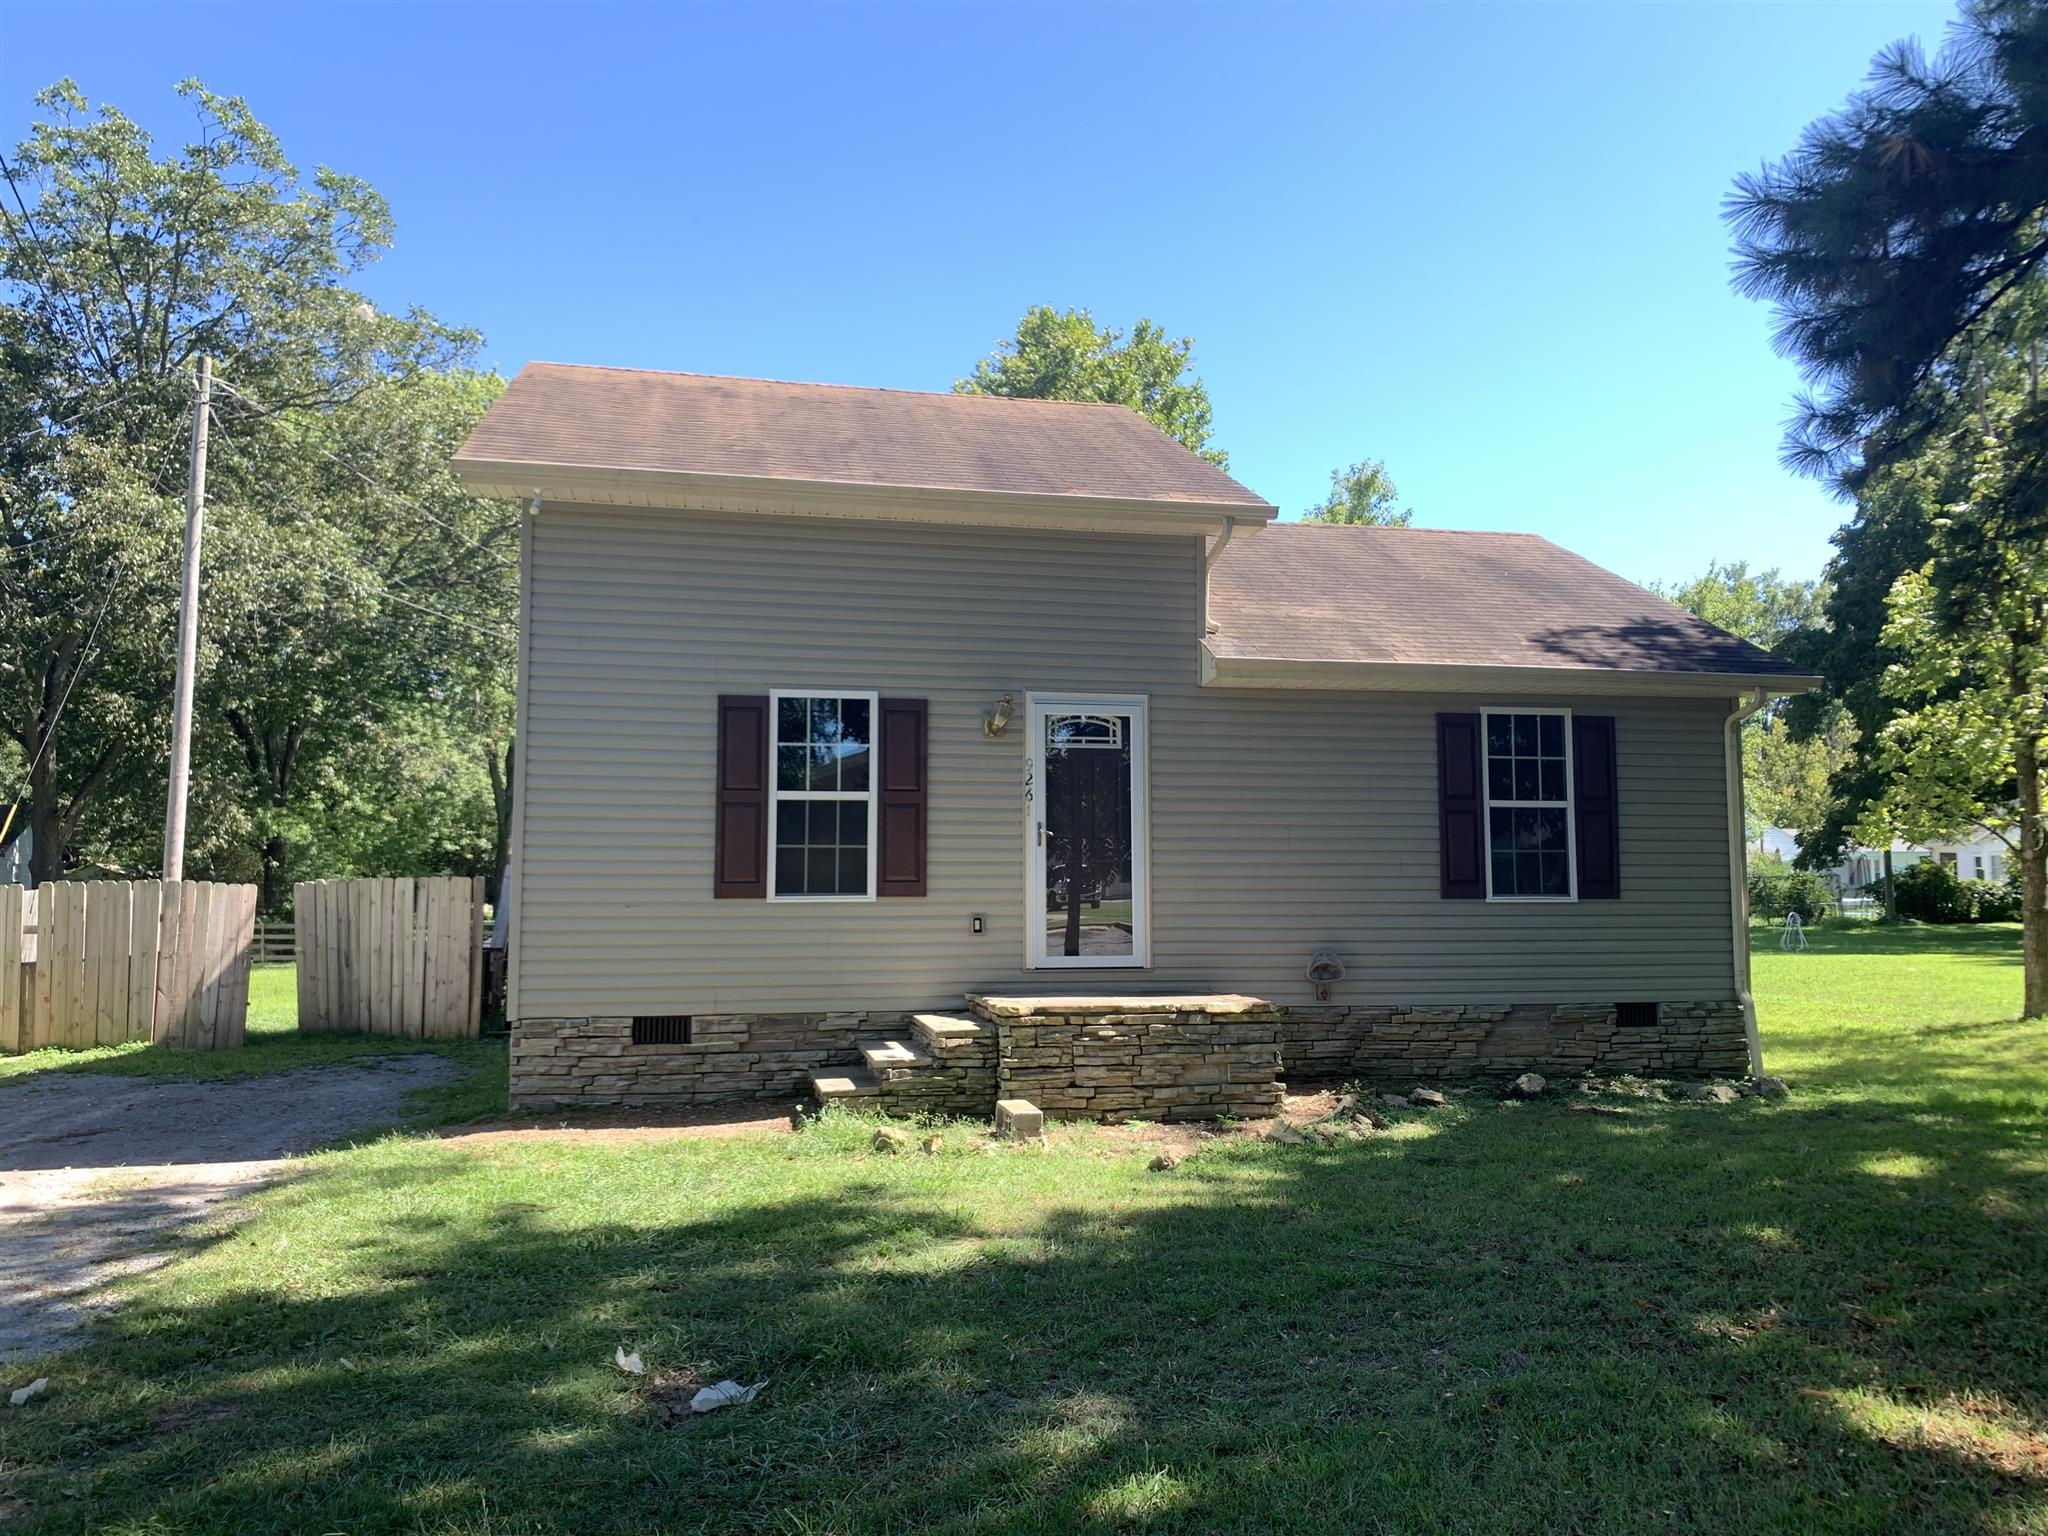 926 E Grundy St, Tullahoma, TN 37388 - Tullahoma, TN real estate listing